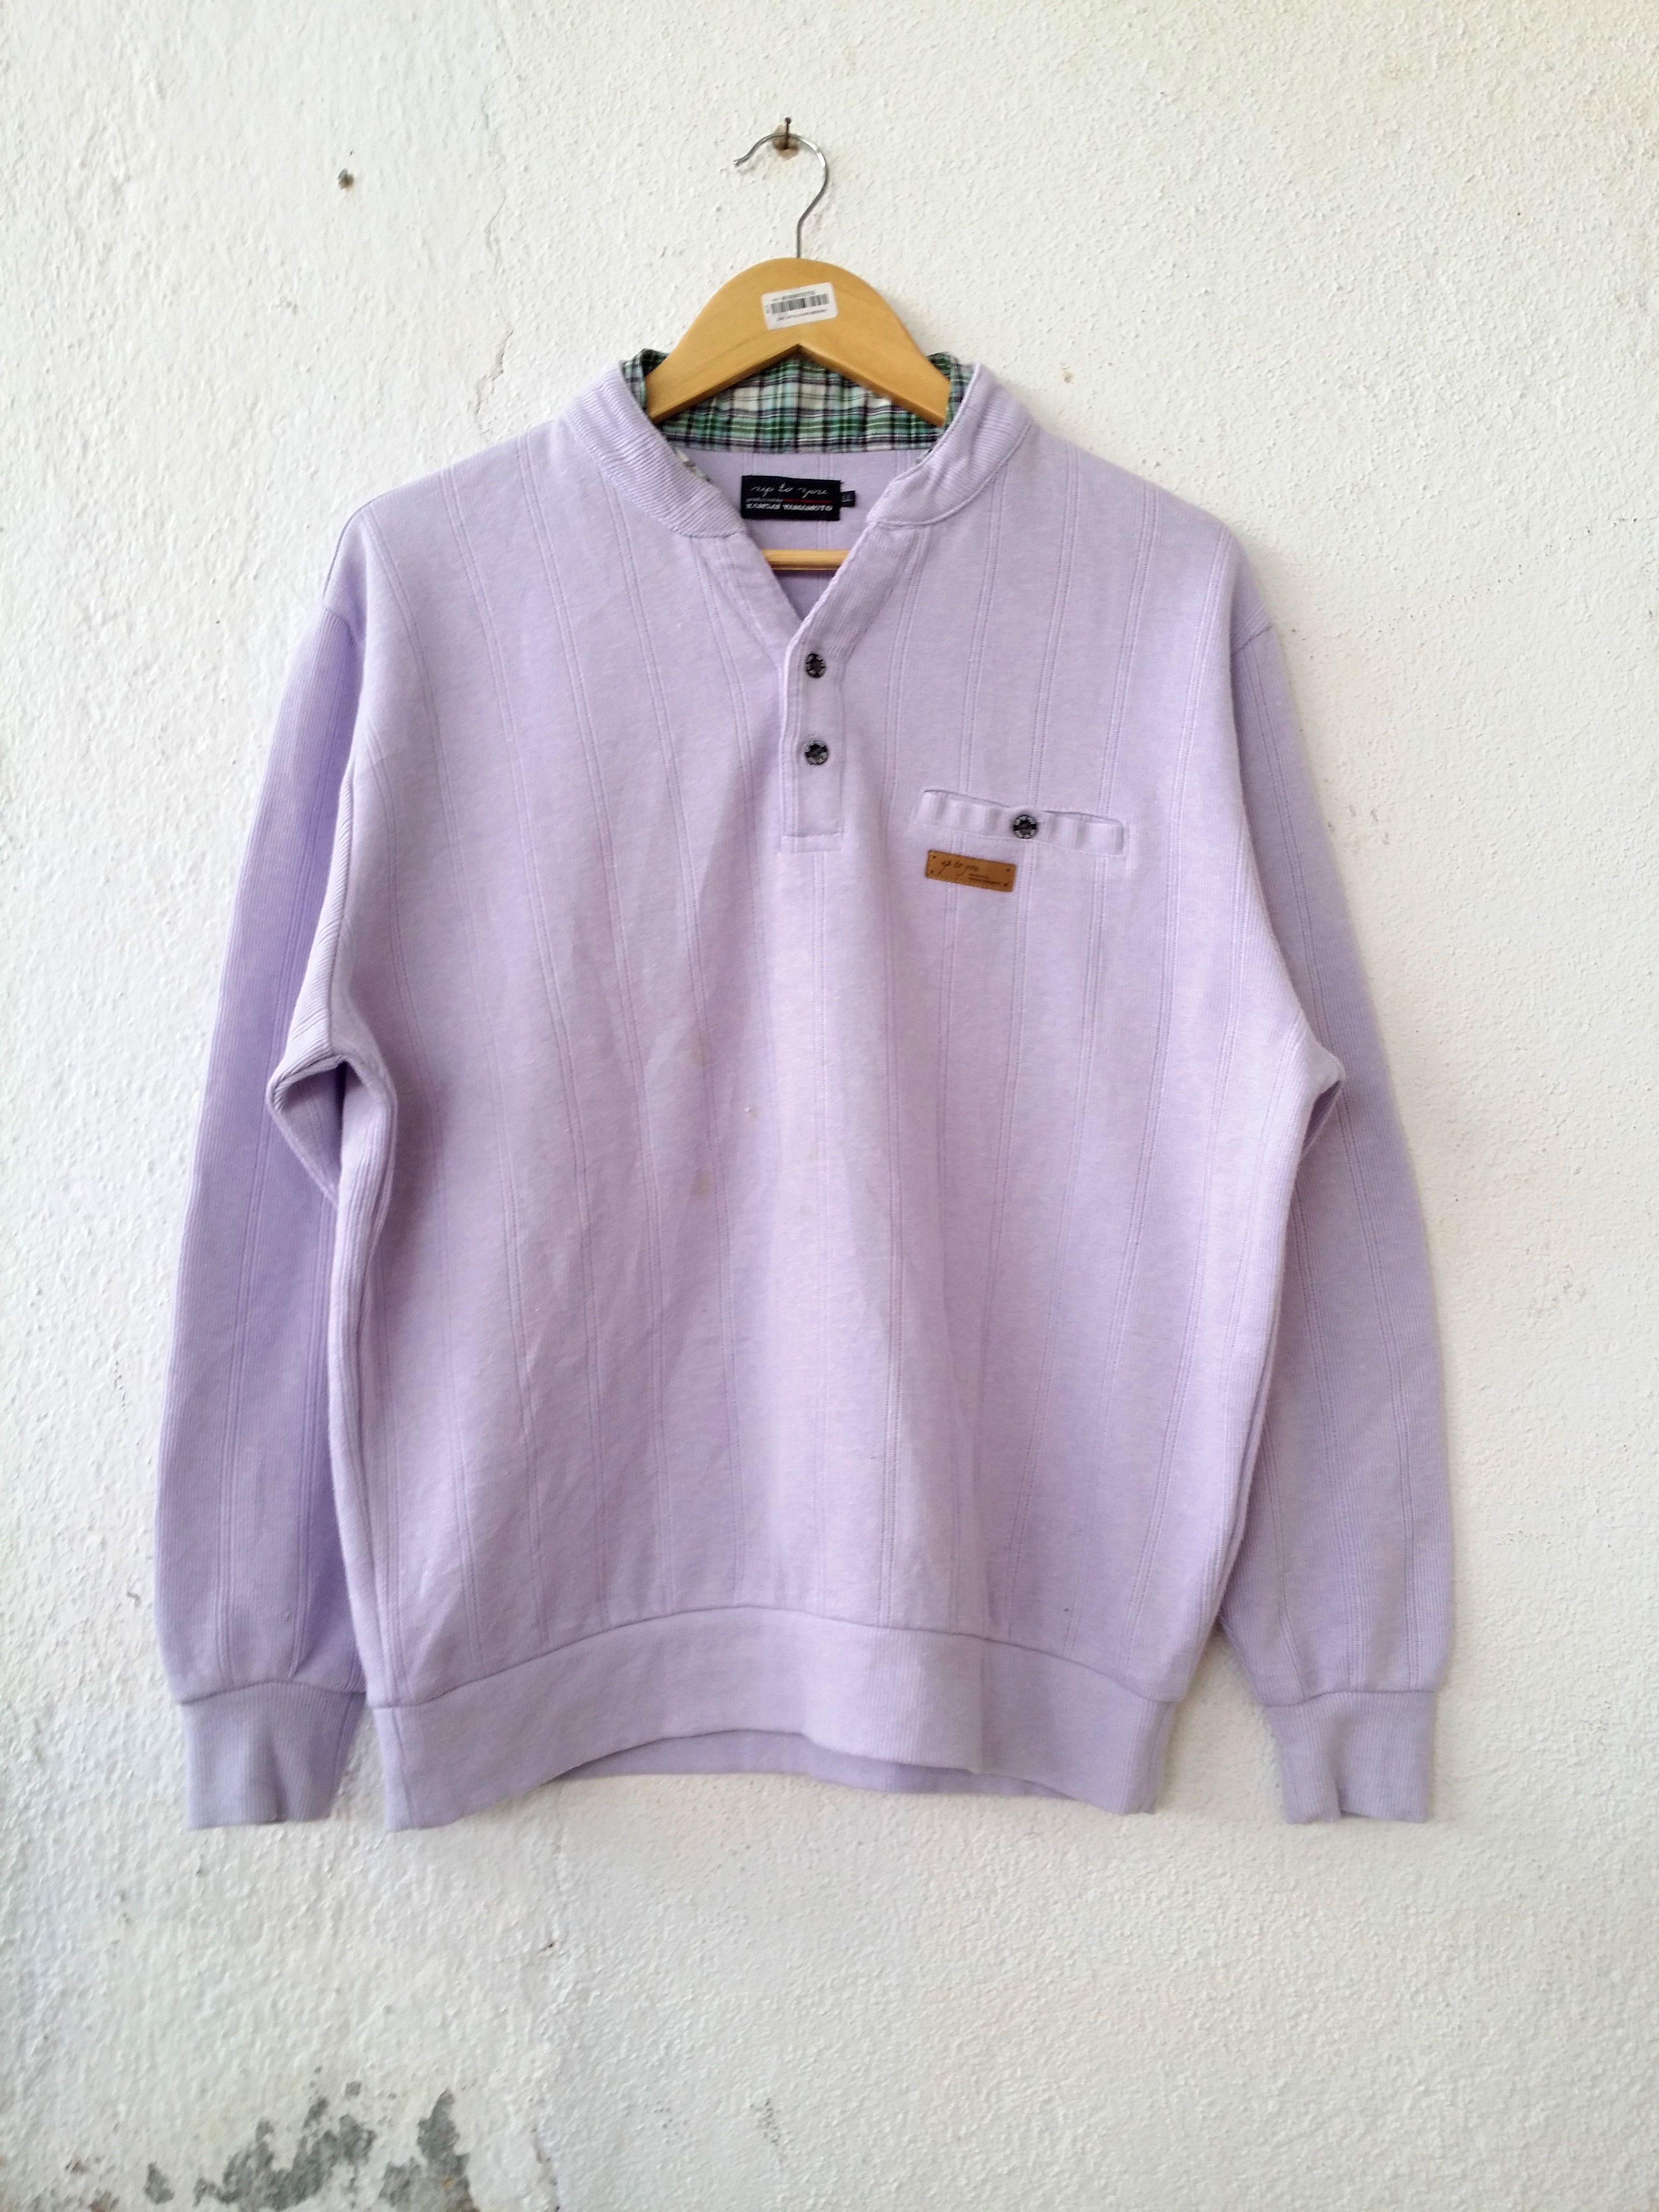 ec0409ddea03 Kansai Yamamoto Sweatshirt Up To You Jumper Pullover Size XL ...